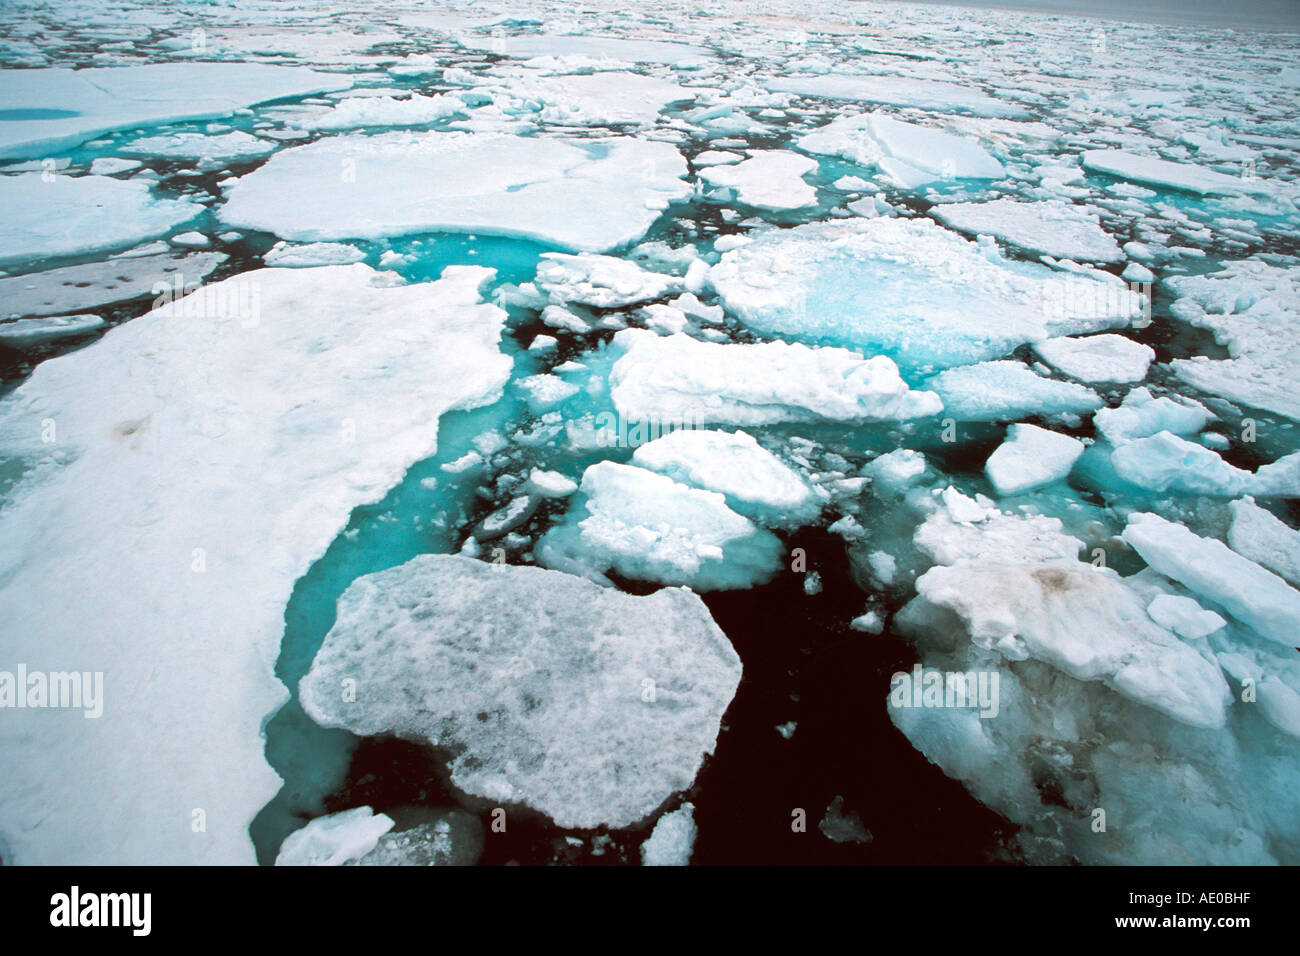 Treibeis Packeis Eisfeld actic Ozean Treibeis Packeis Eisfeld Arktis Kreation Svalbard Spitzbergen Norwegen Stockfoto